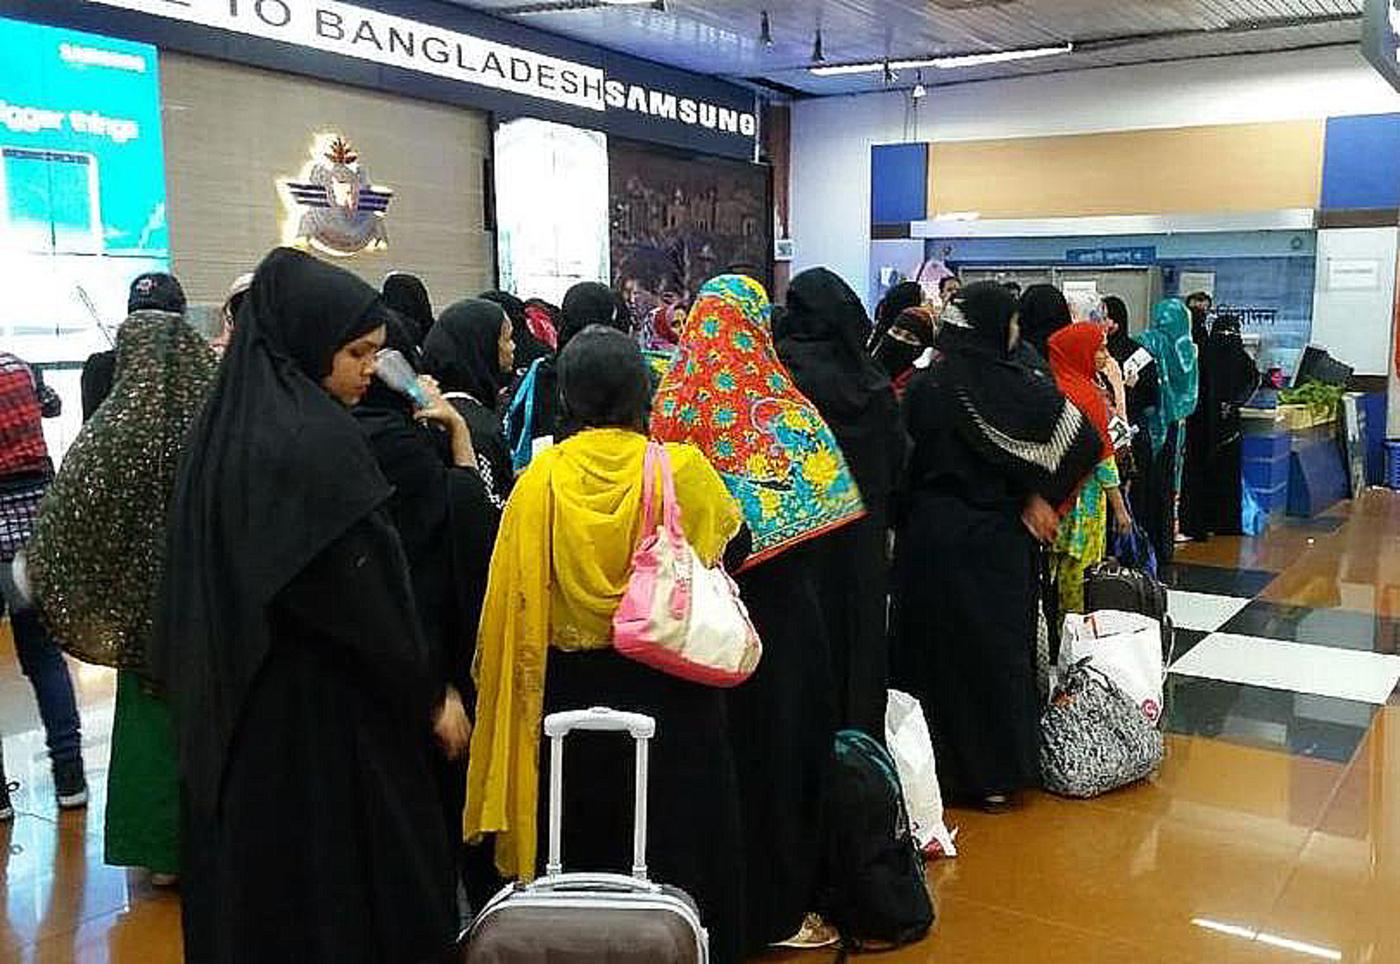 Saudi sex abuse: Scores of Bangladeshi women escape to